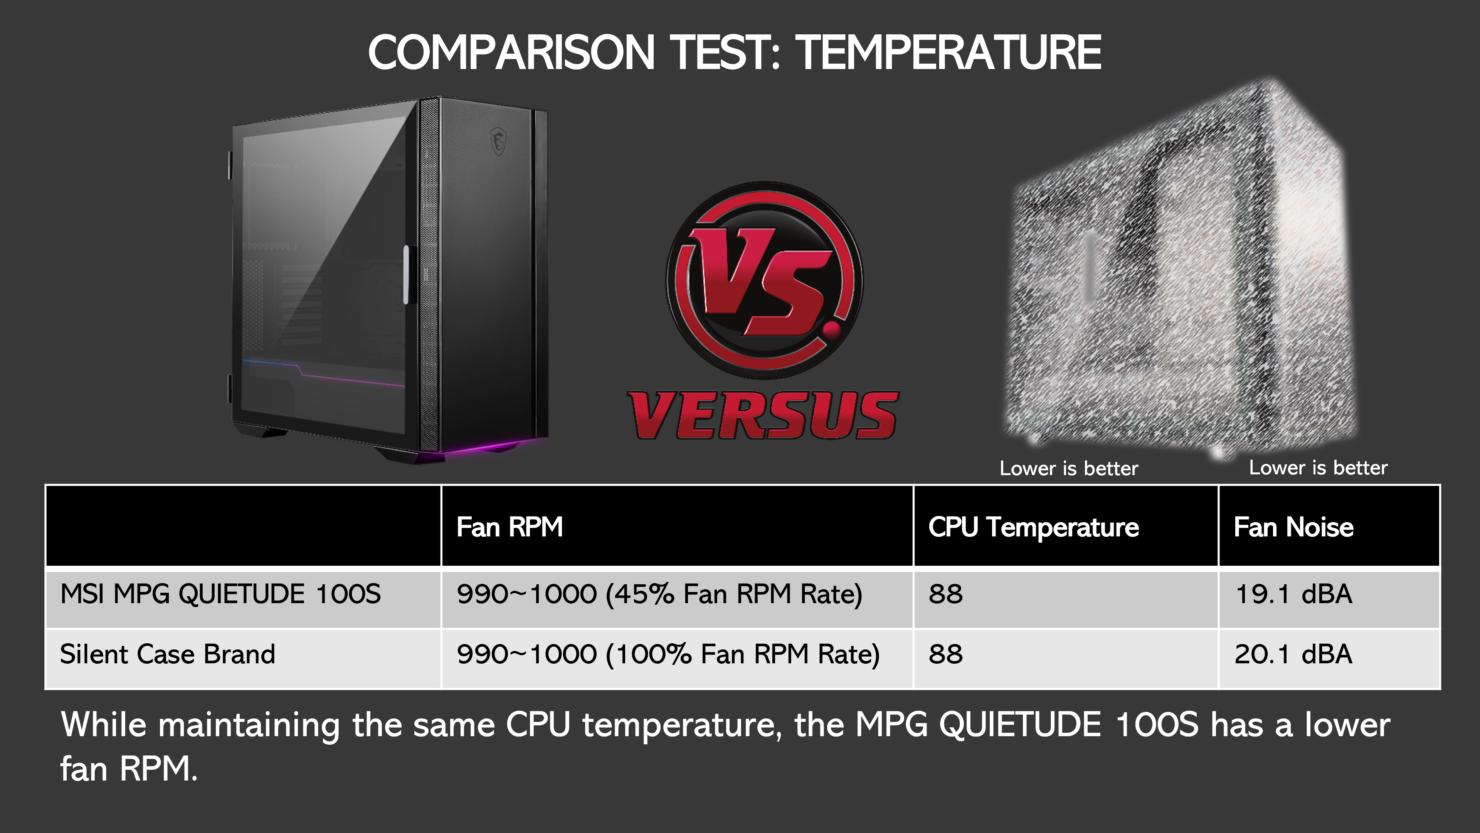 msi-mpg-quietude-100s-pc-chassis-with-meg-gale-p12-fans-vs-fractal-design-r6-_2